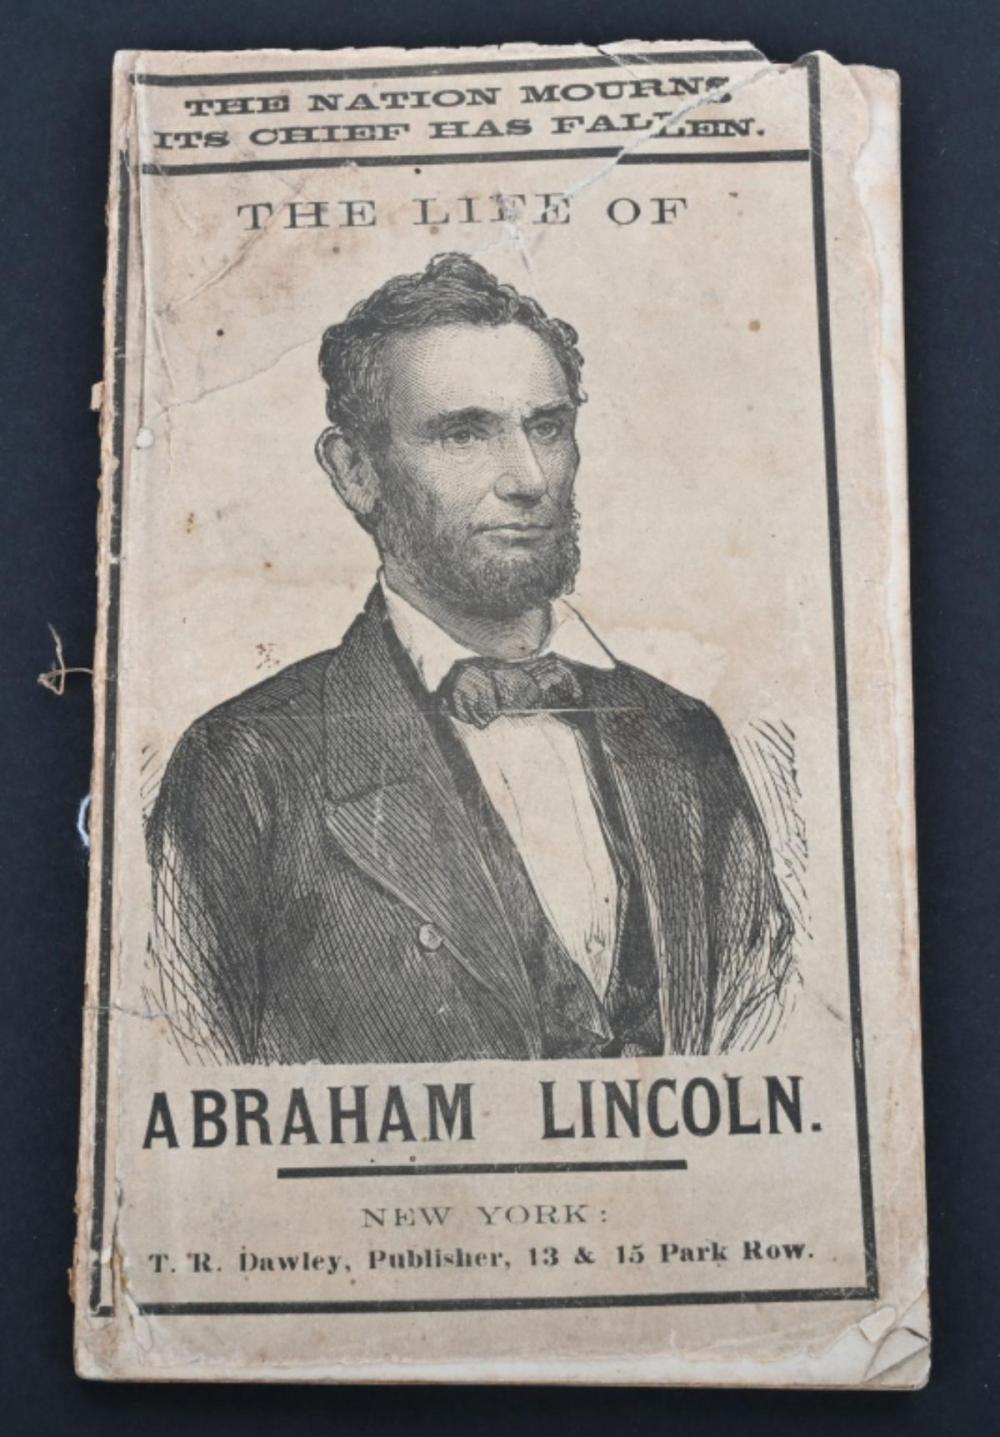 1865 THE LIFE OF ABRAHAM LINCOLN, ABOTT